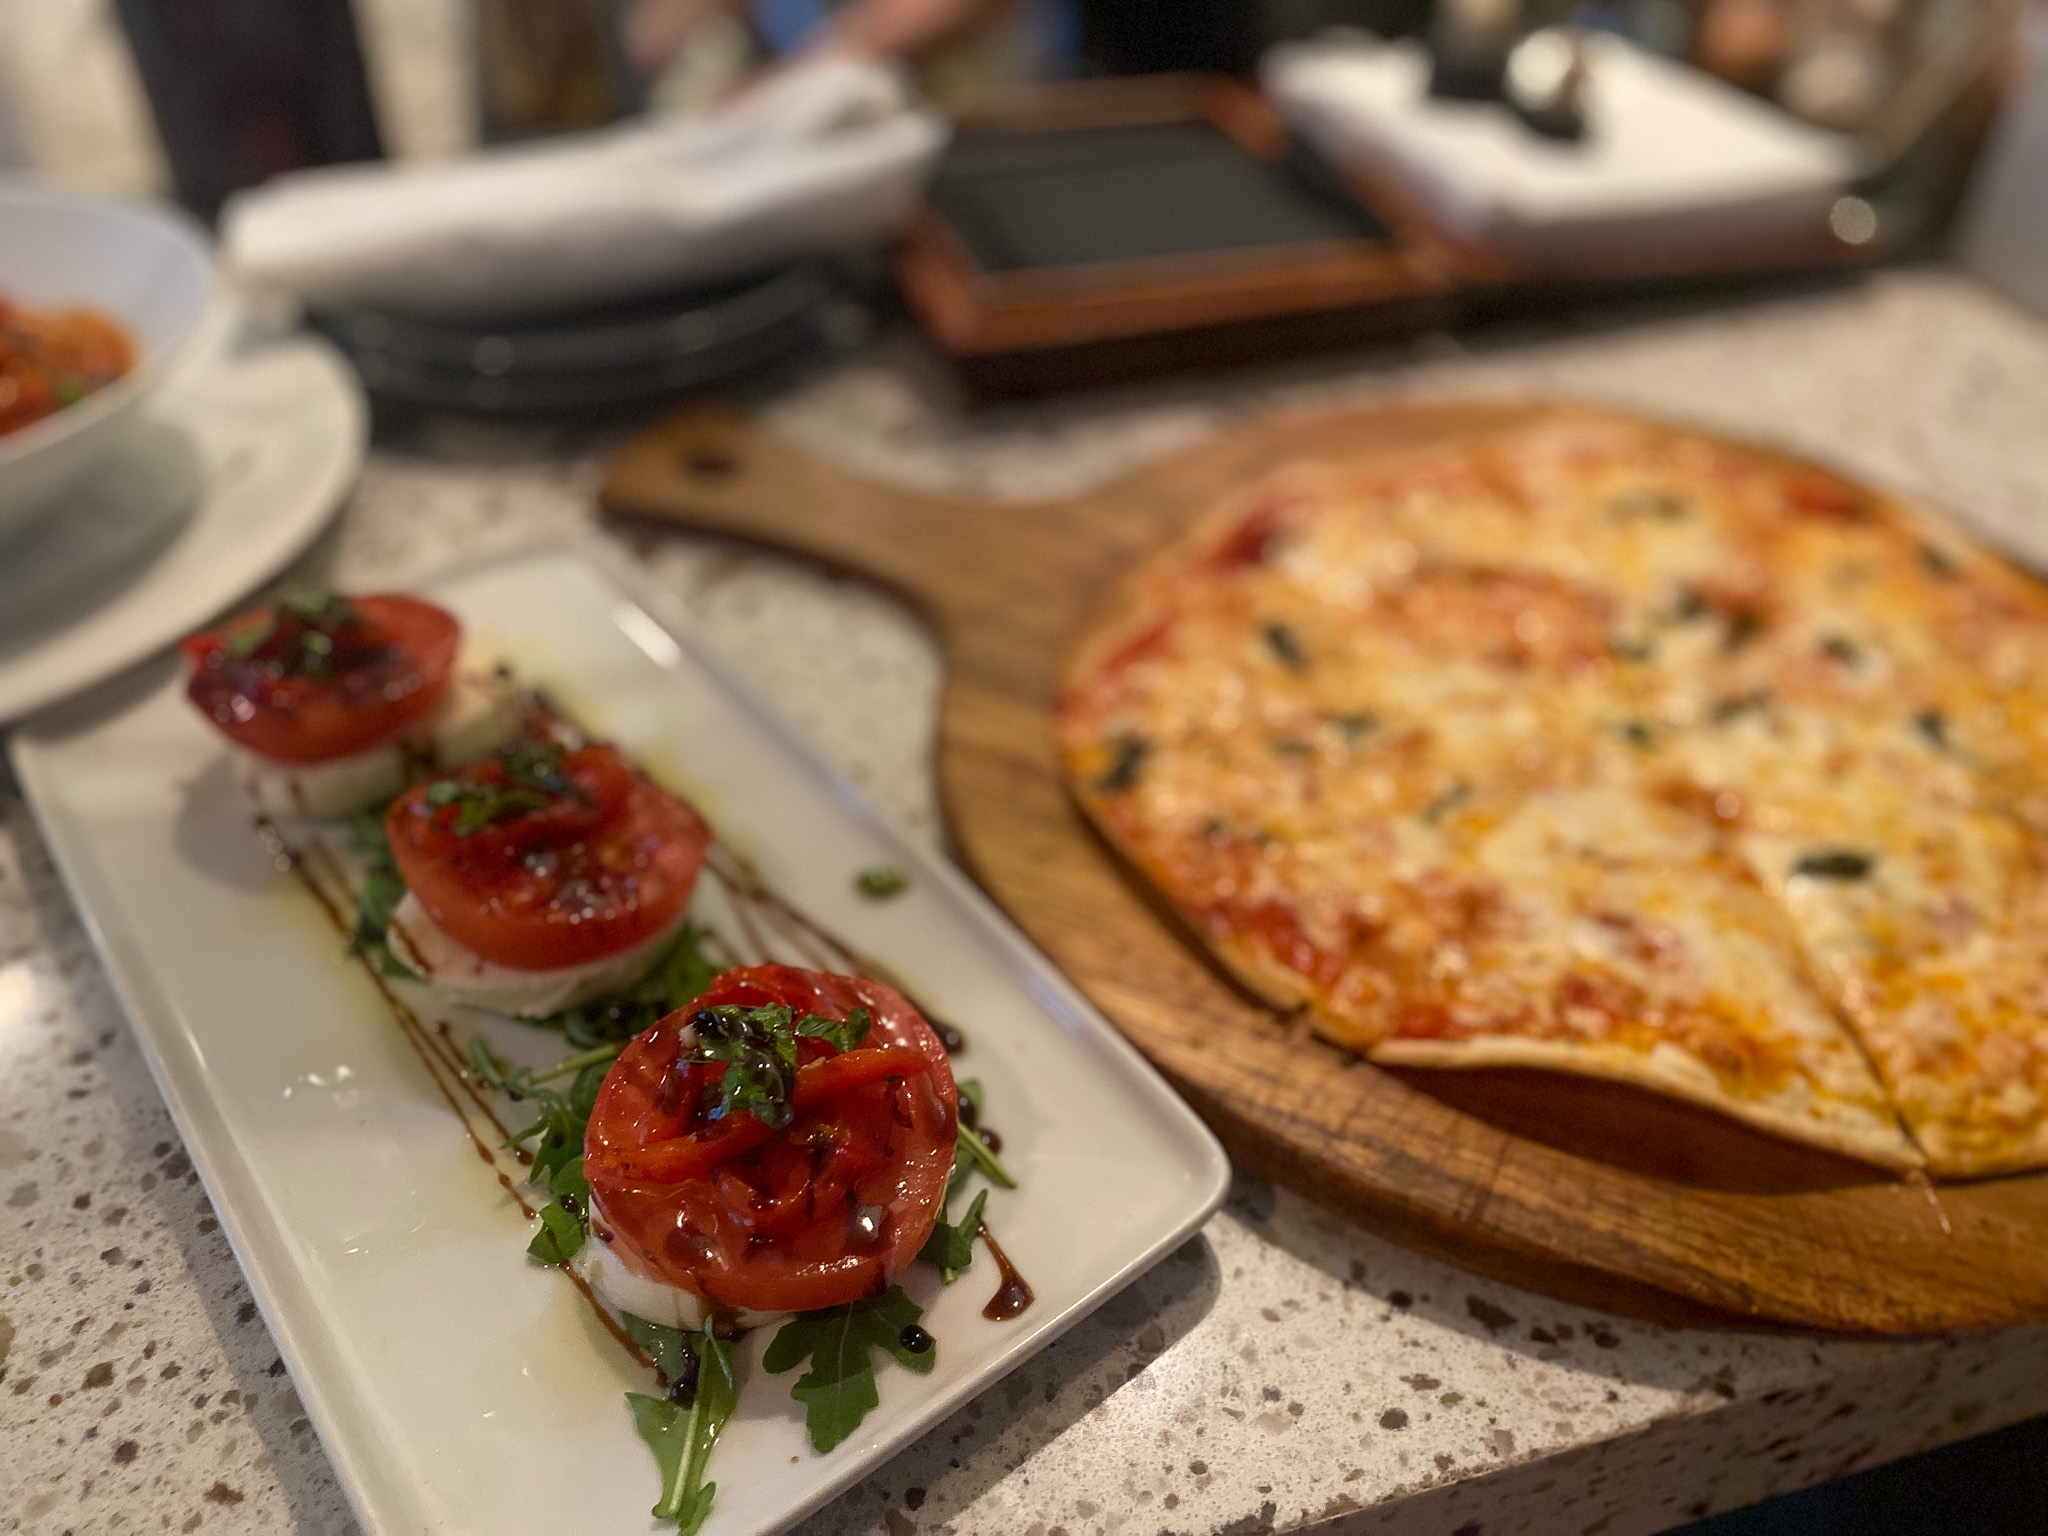 Caprese Salad and the Pizzetta